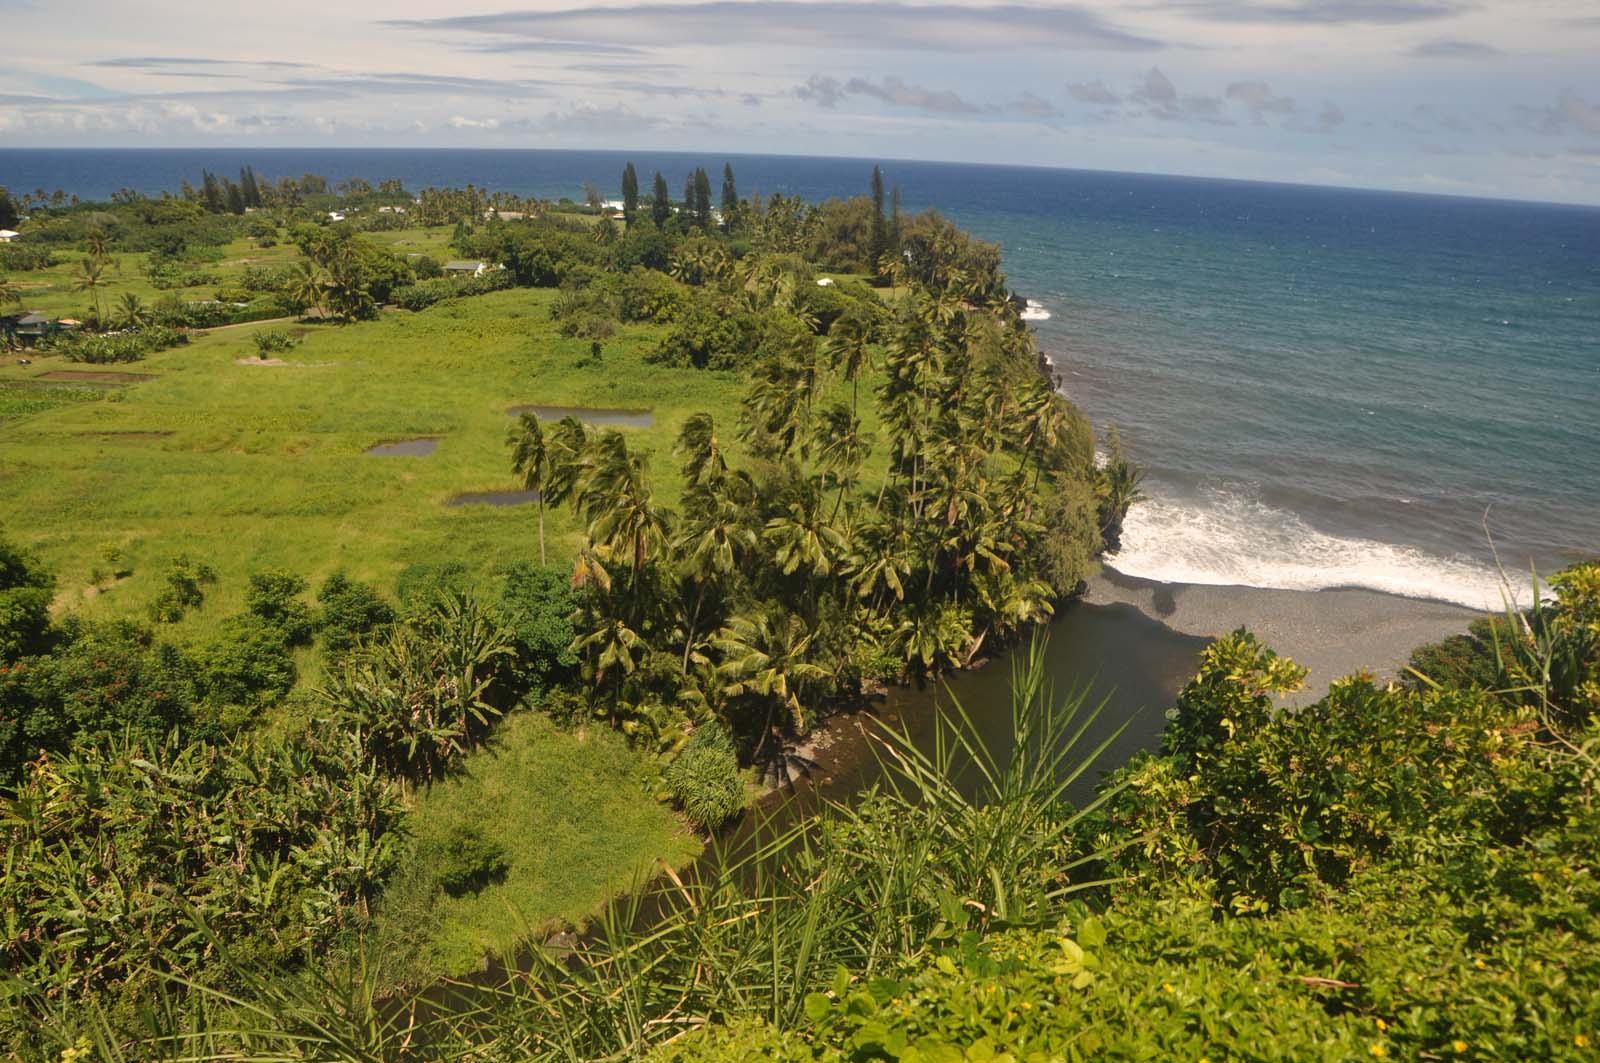 140_maui_hawaii_island